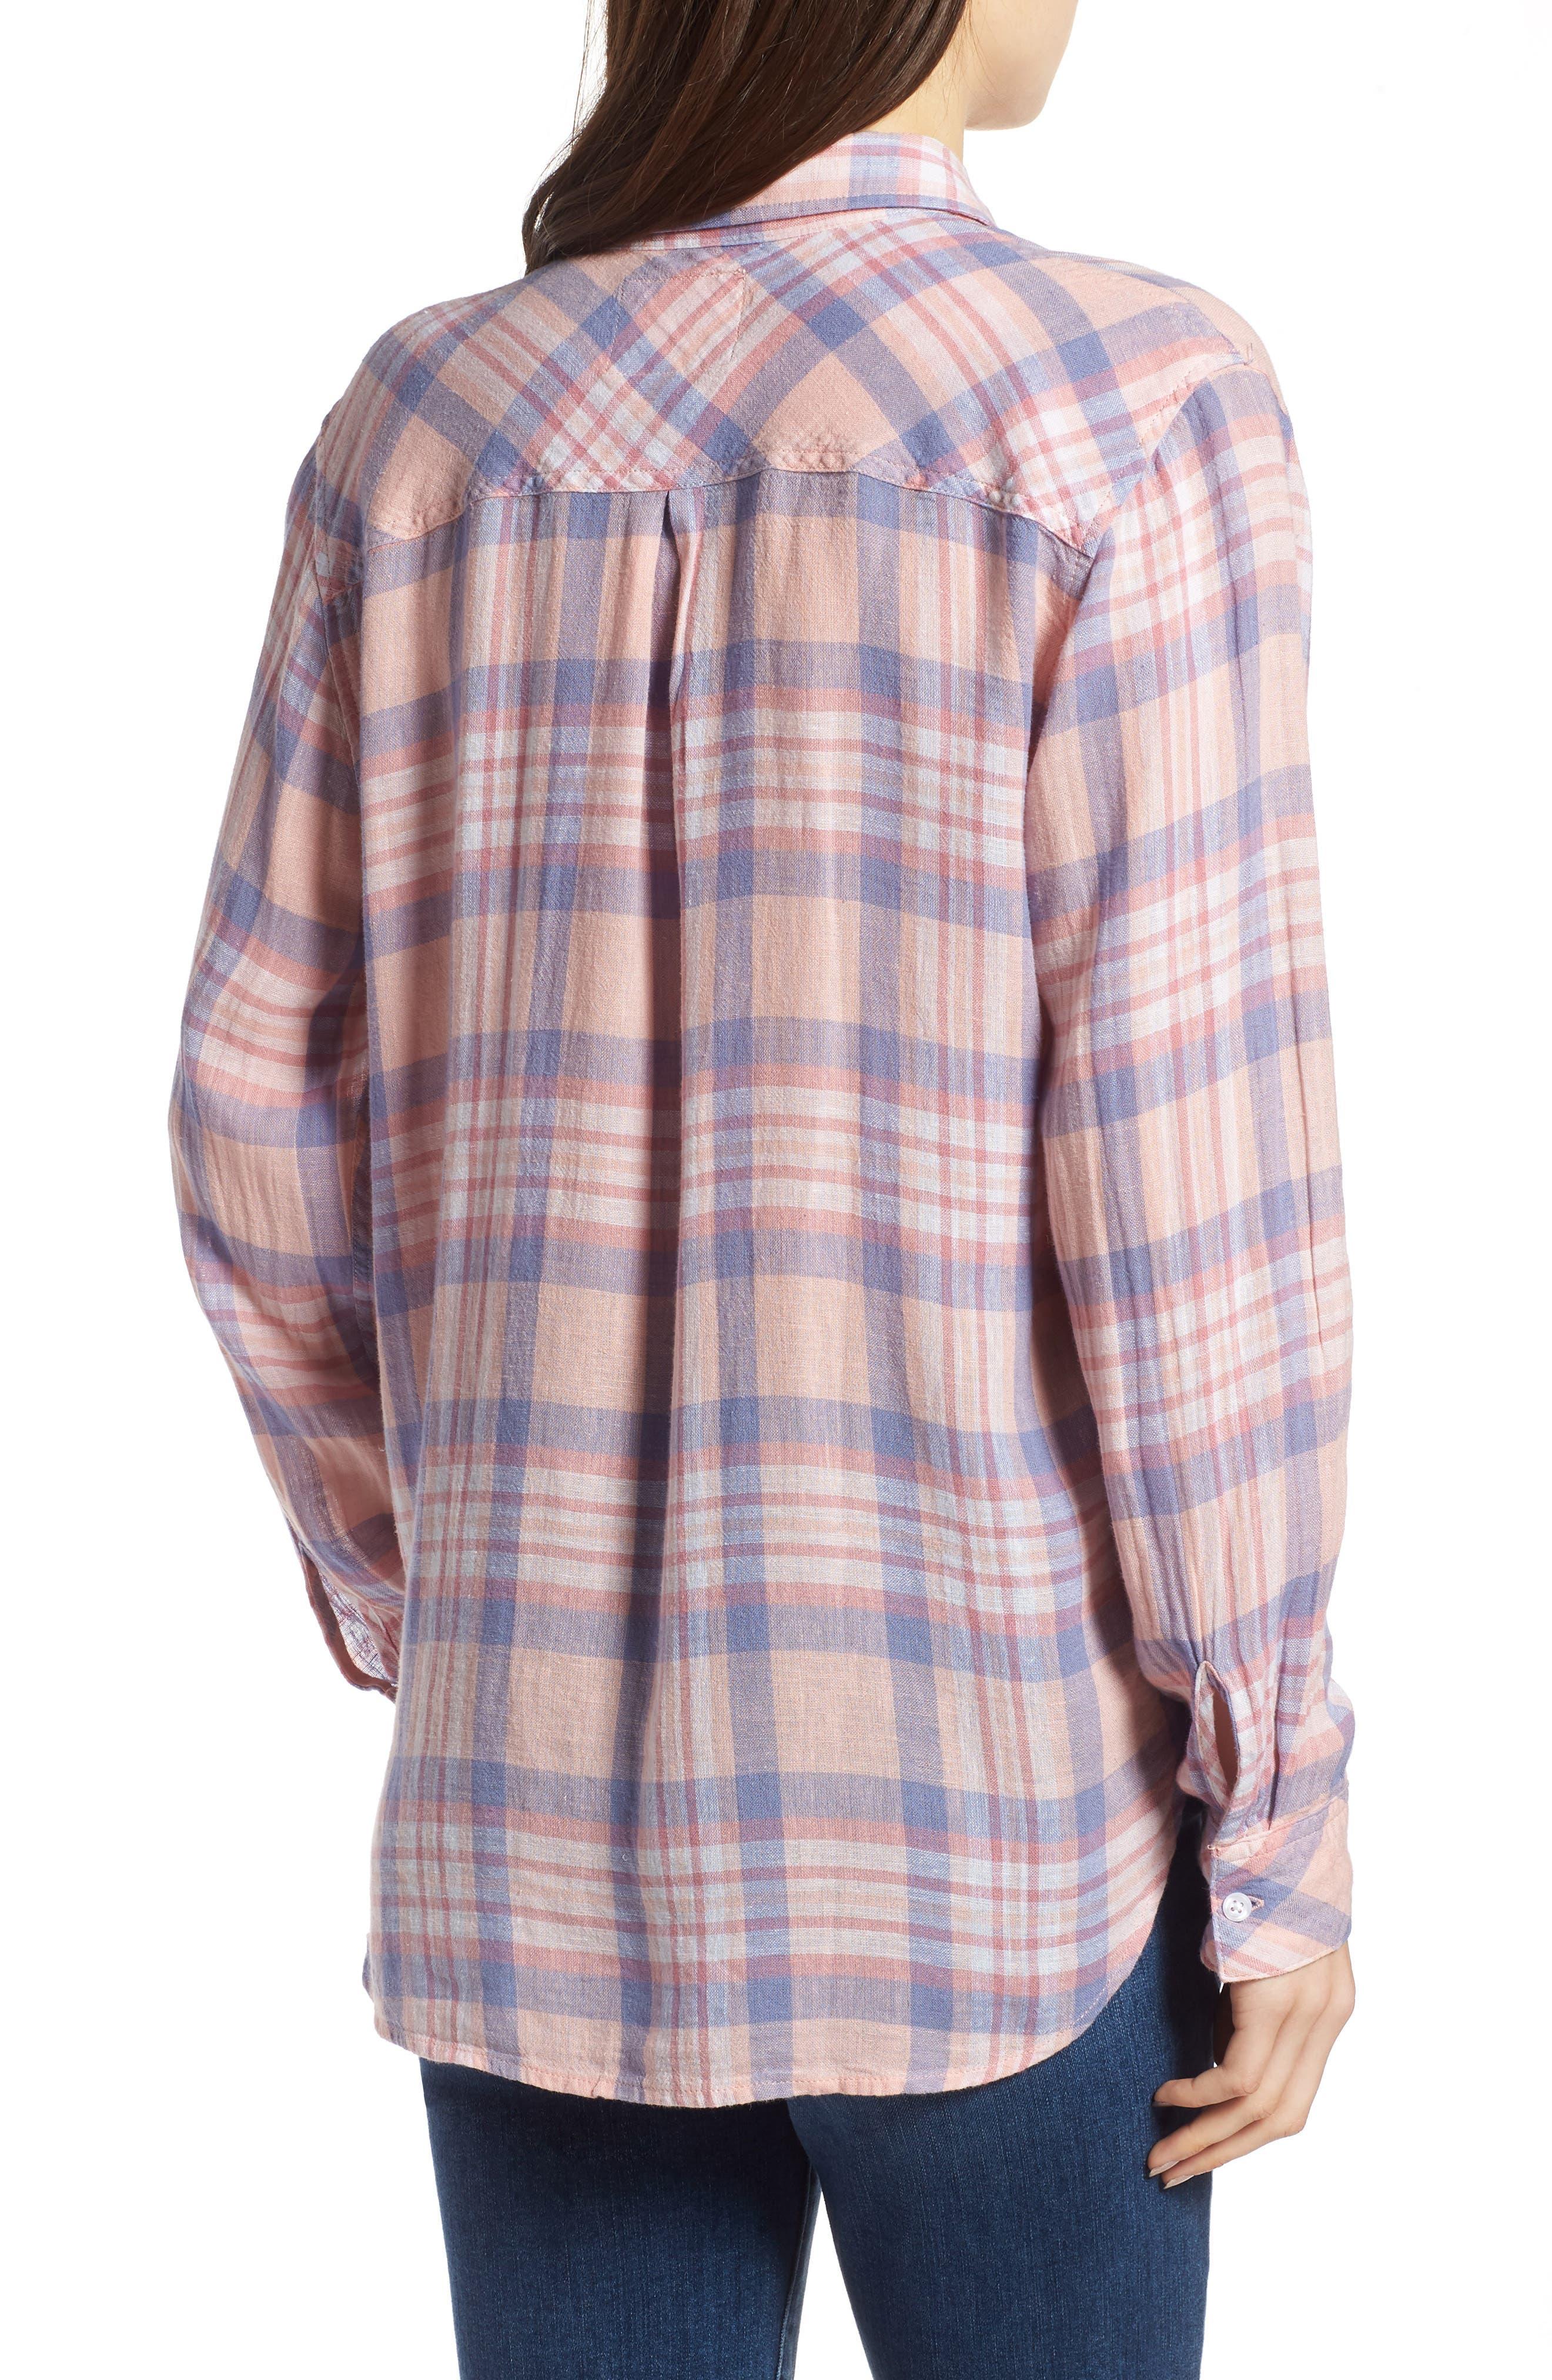 Charli Shirt,                             Alternate thumbnail 2, color,                             Peach Blush Blue